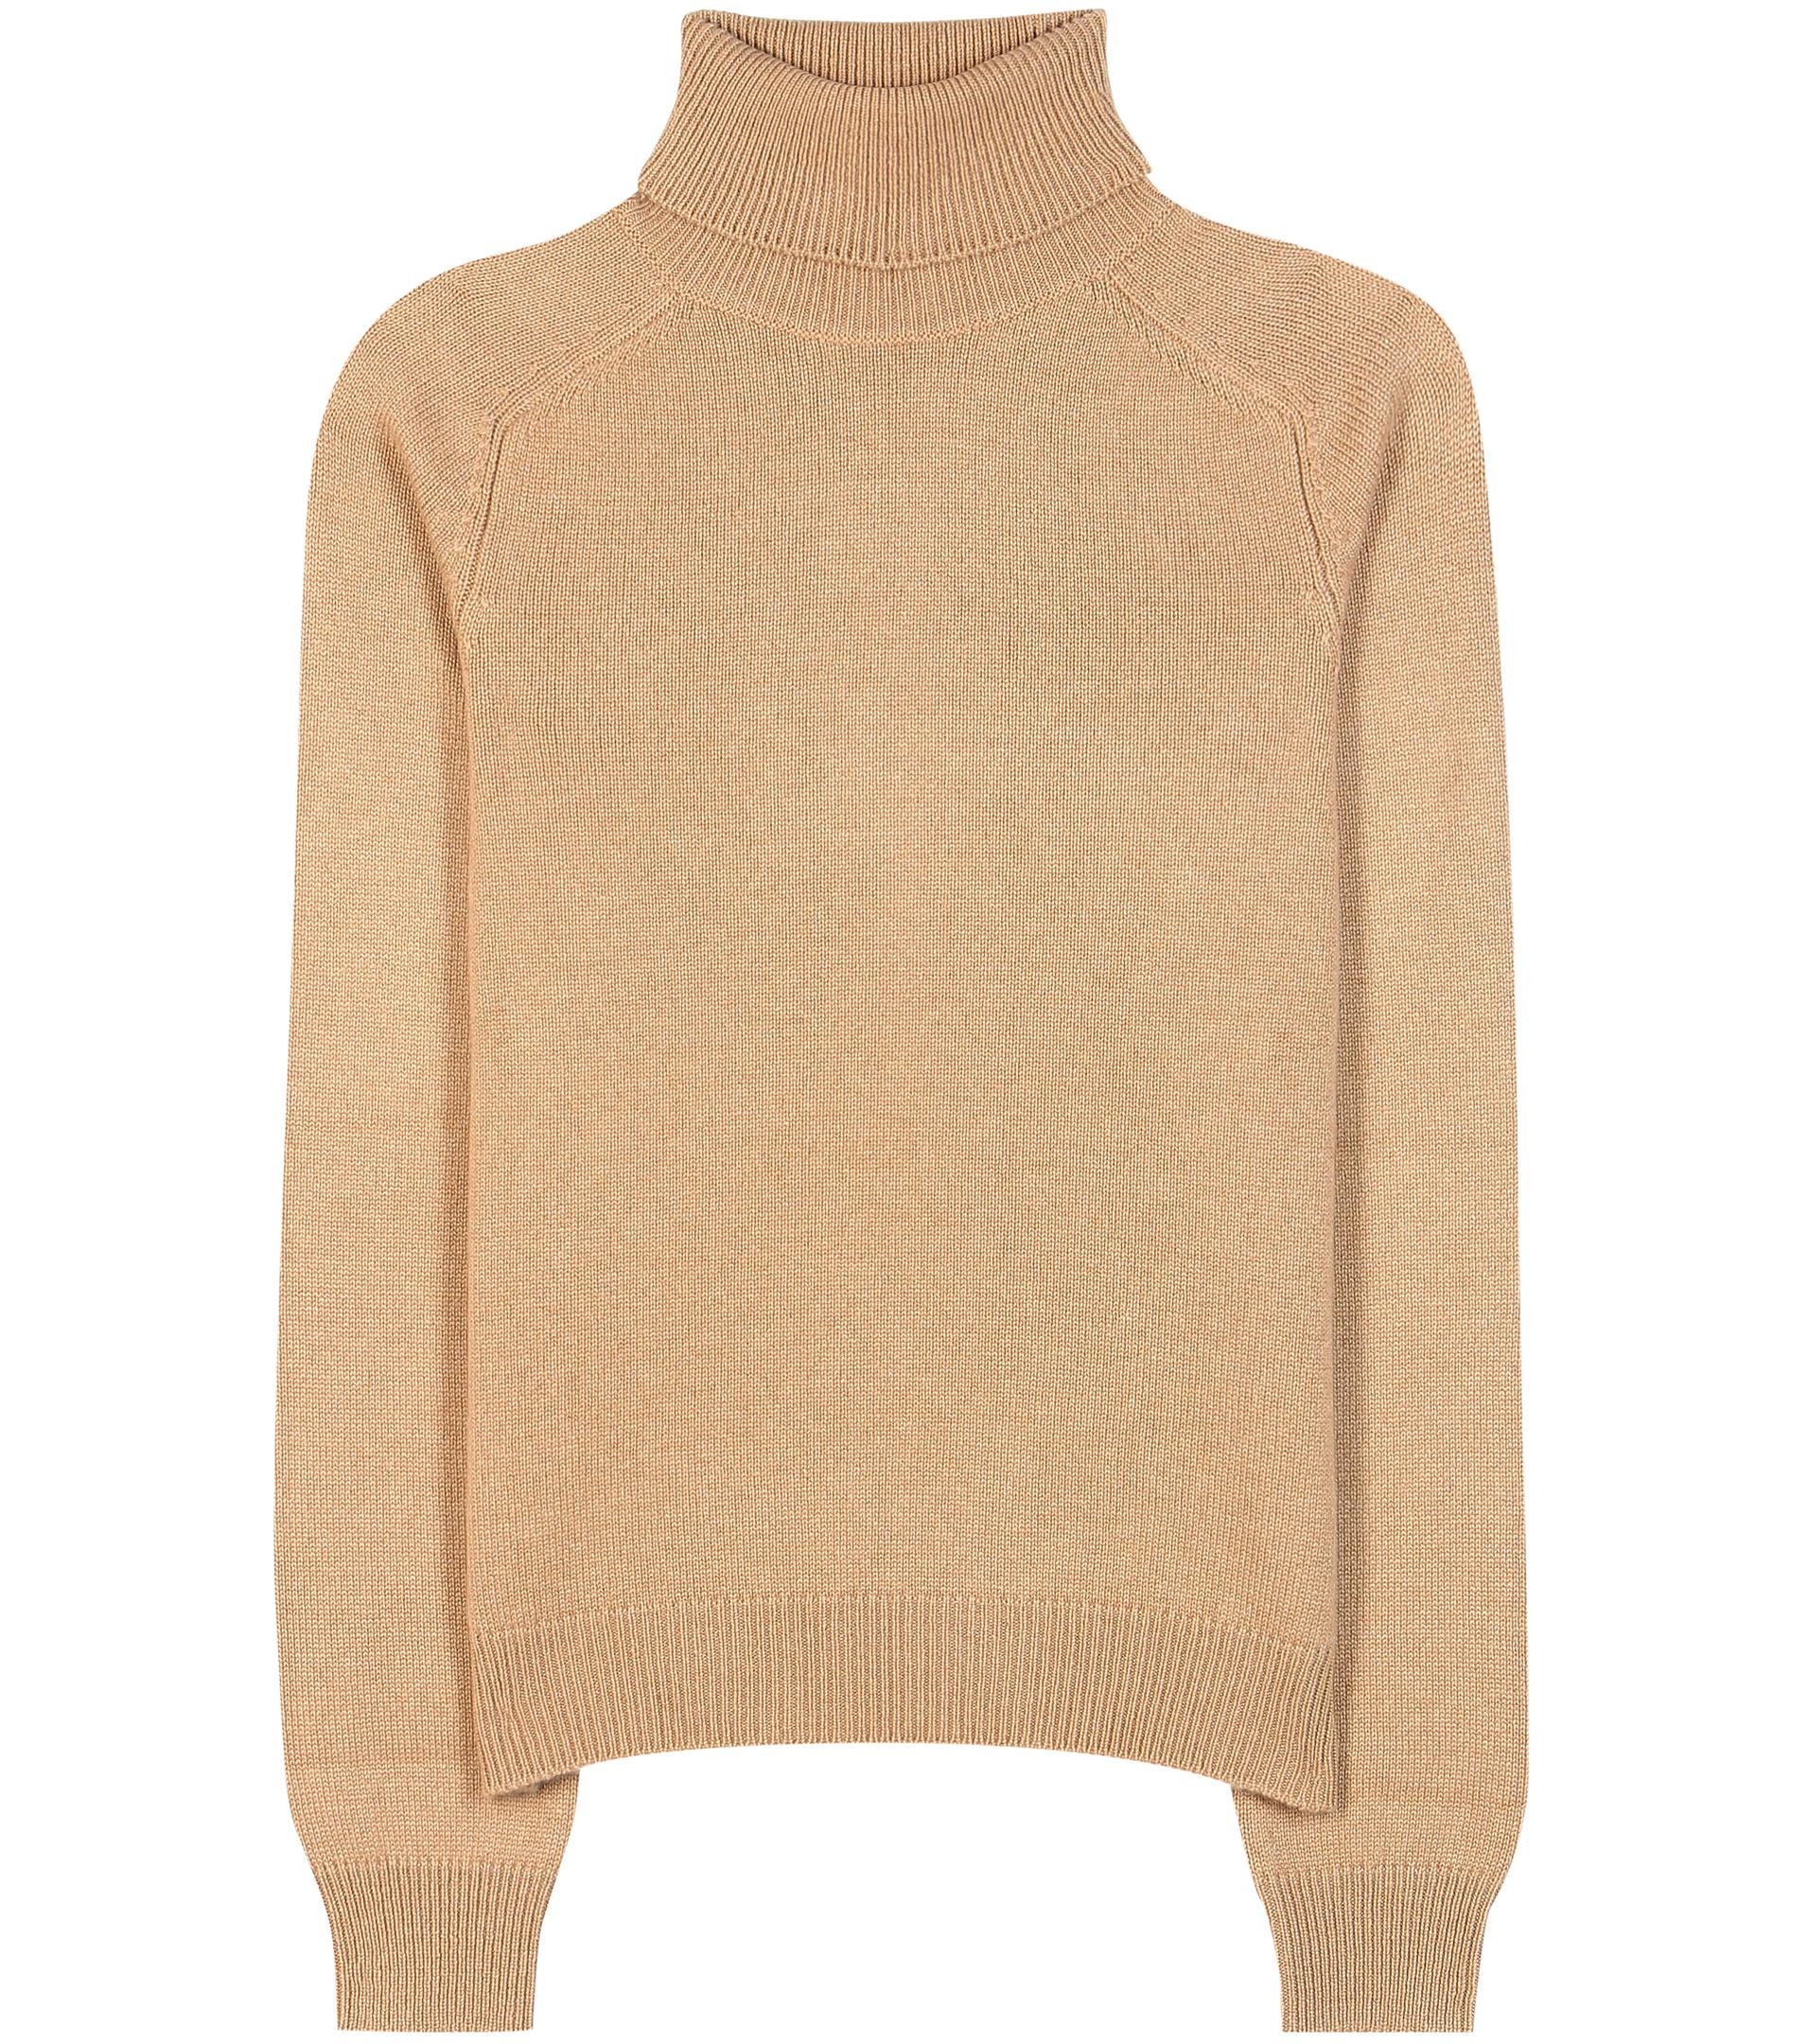 Camel cashmere turtleneck sweater by saint laurent color natural